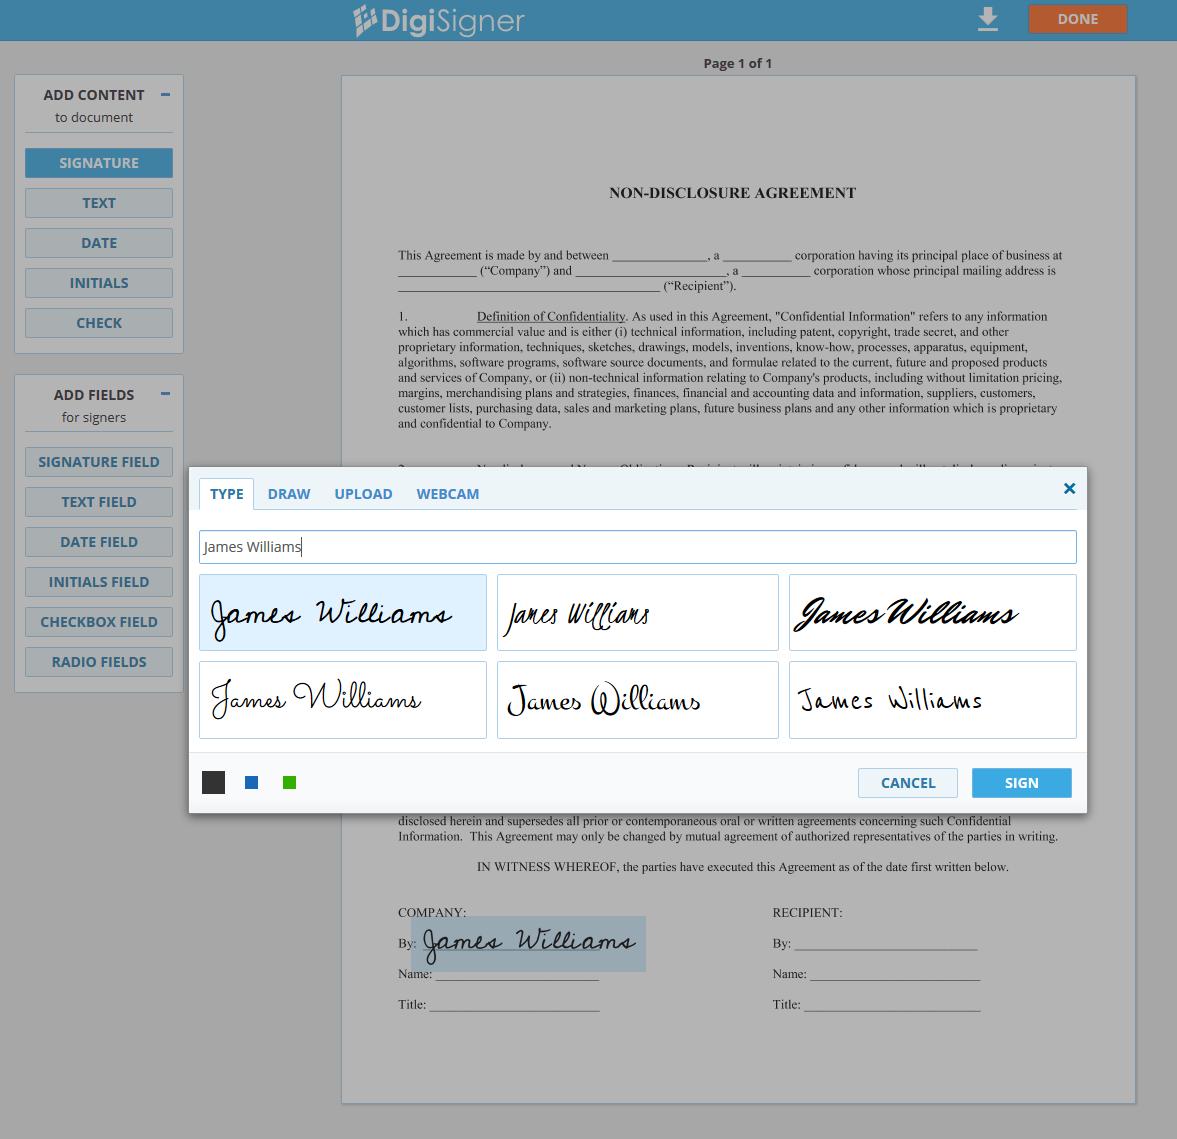 DigiSigner Software - Sign document